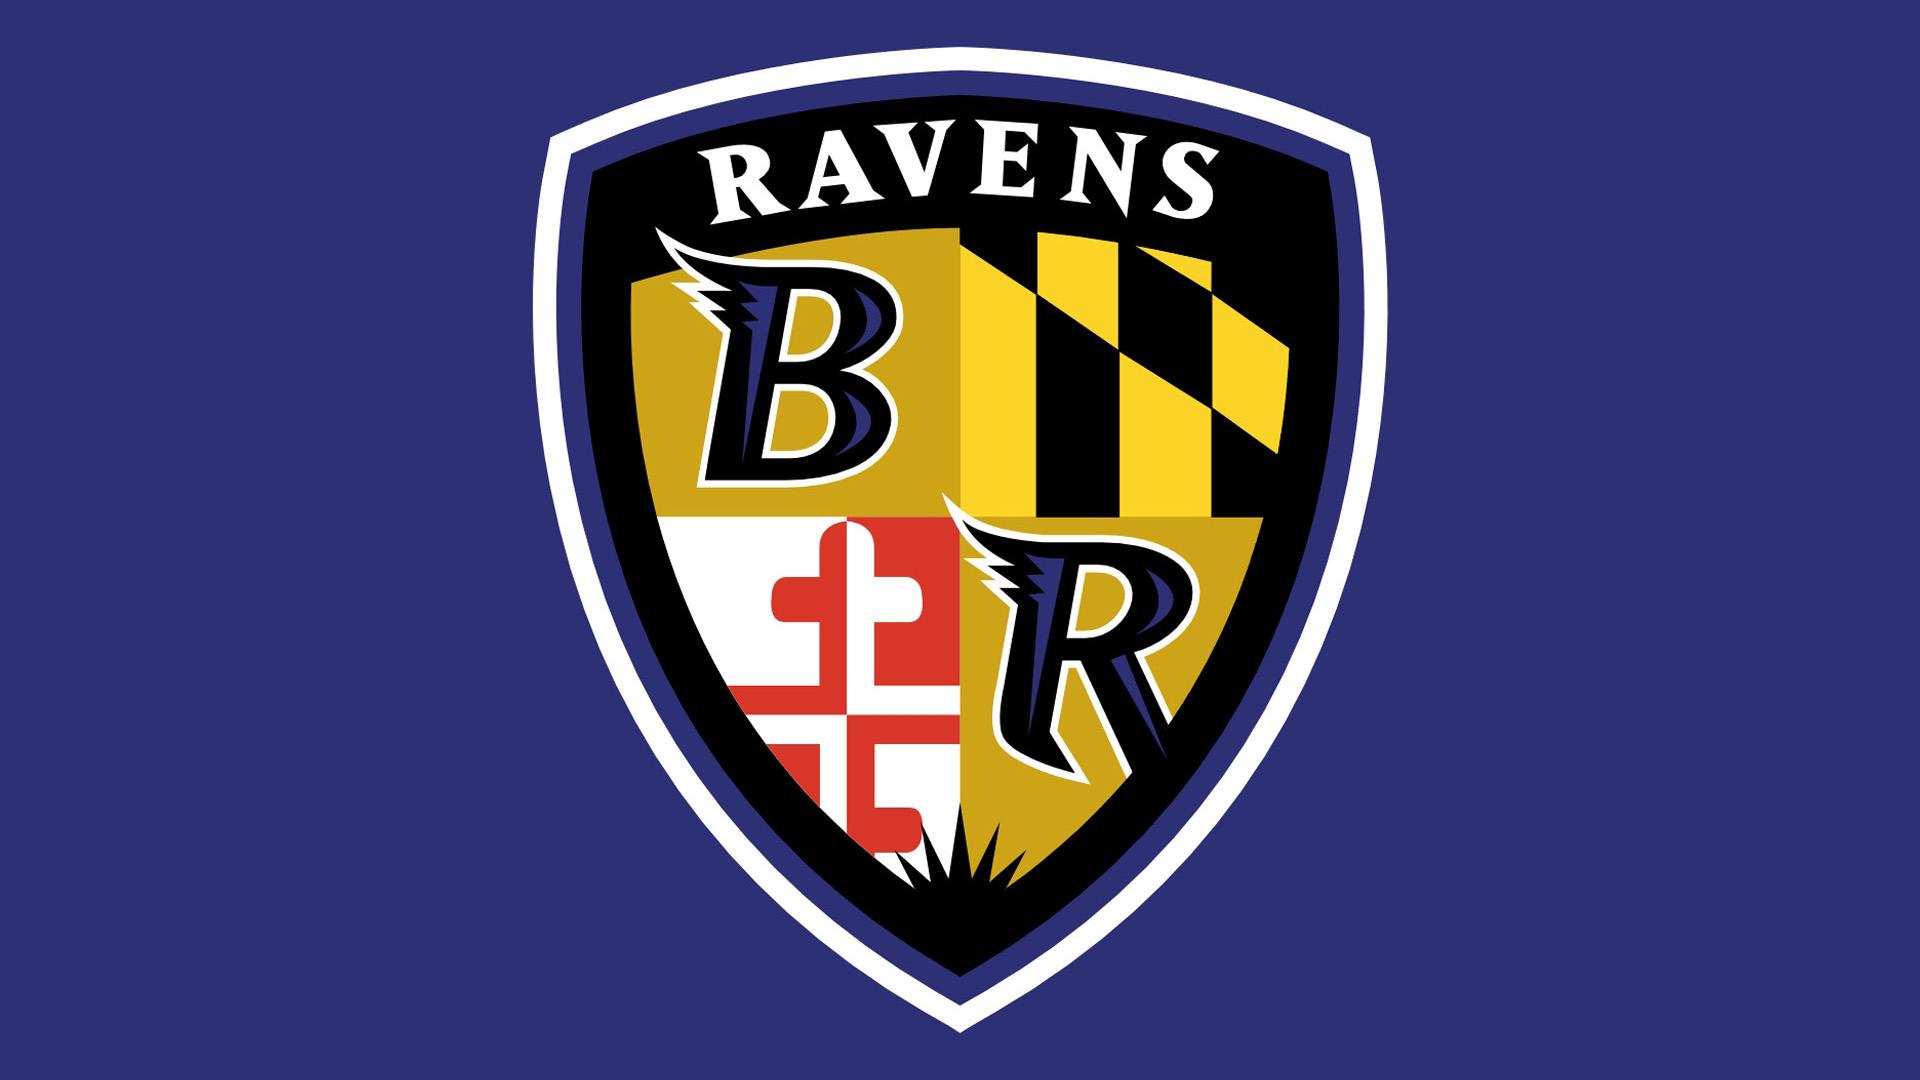 Baltimore Screensavers Screensaver Shield Ravens Raven wallpapers HD 1920x1080